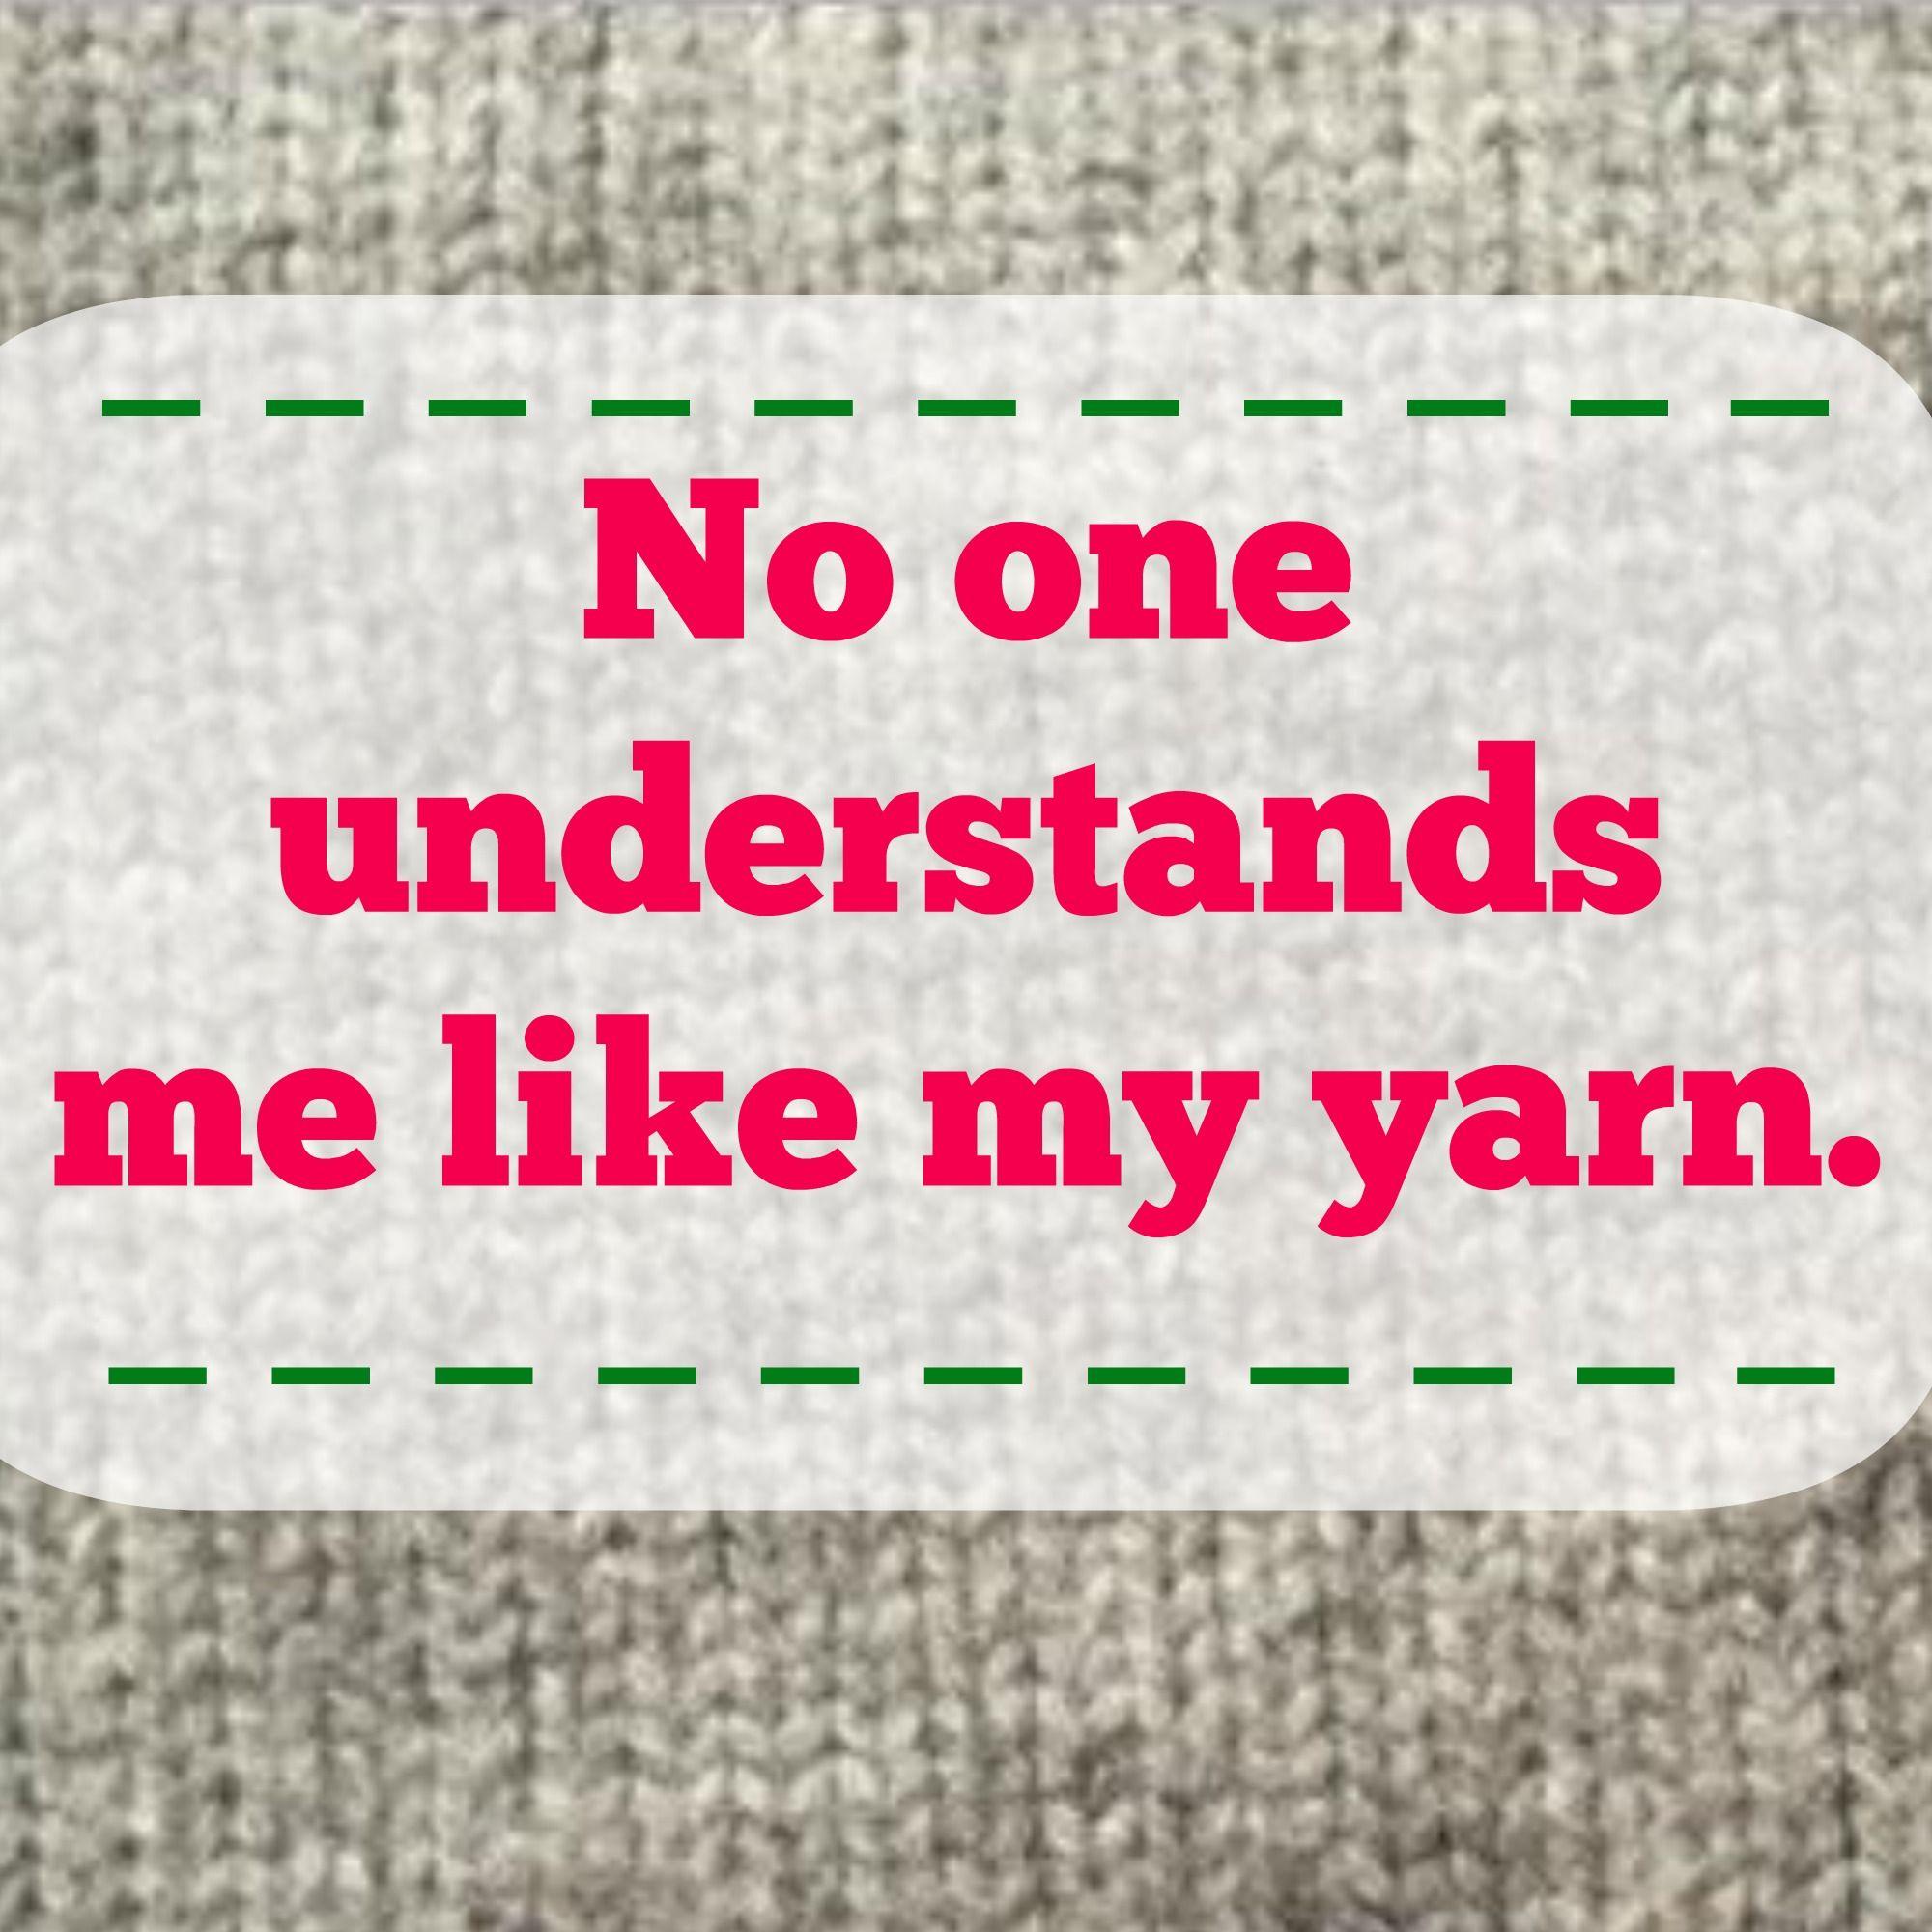 100s Free Knitting Patterns | Yarns, Crochet and Crochet humor